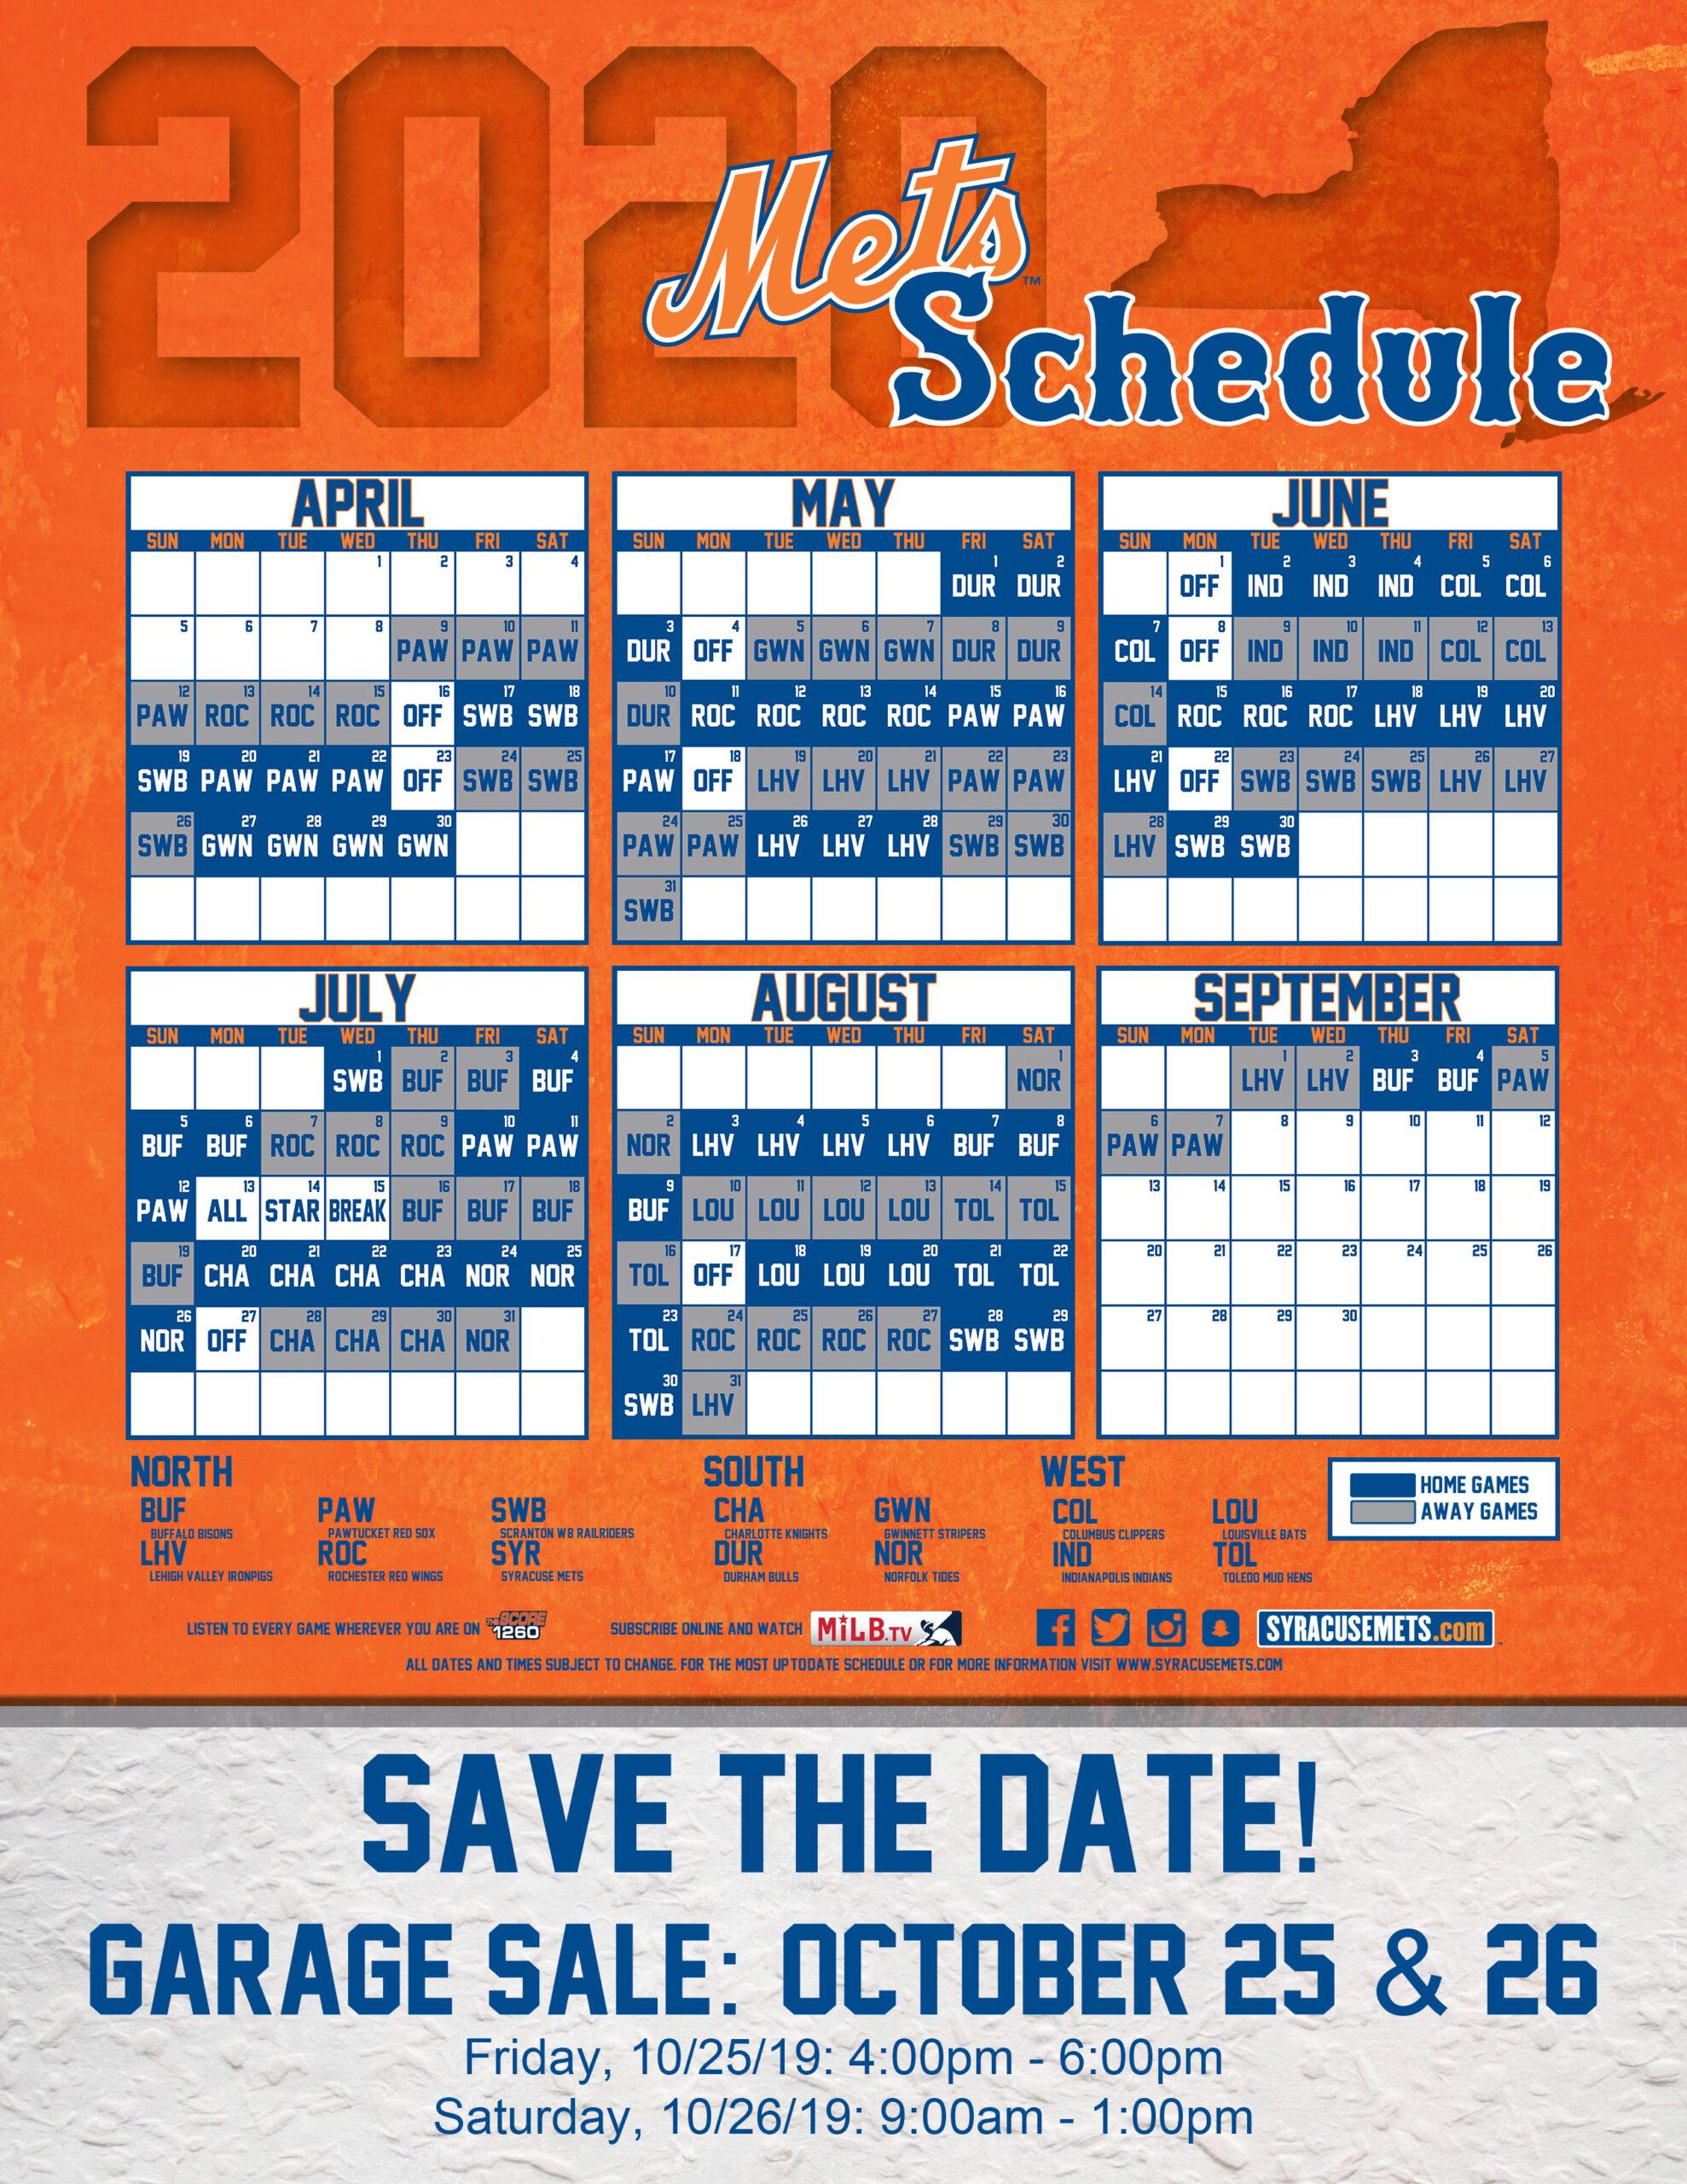 Atlanta Braves Schedule 2020 Printable | Calendar For Planning in Atlanta Braves Schedule Calendar